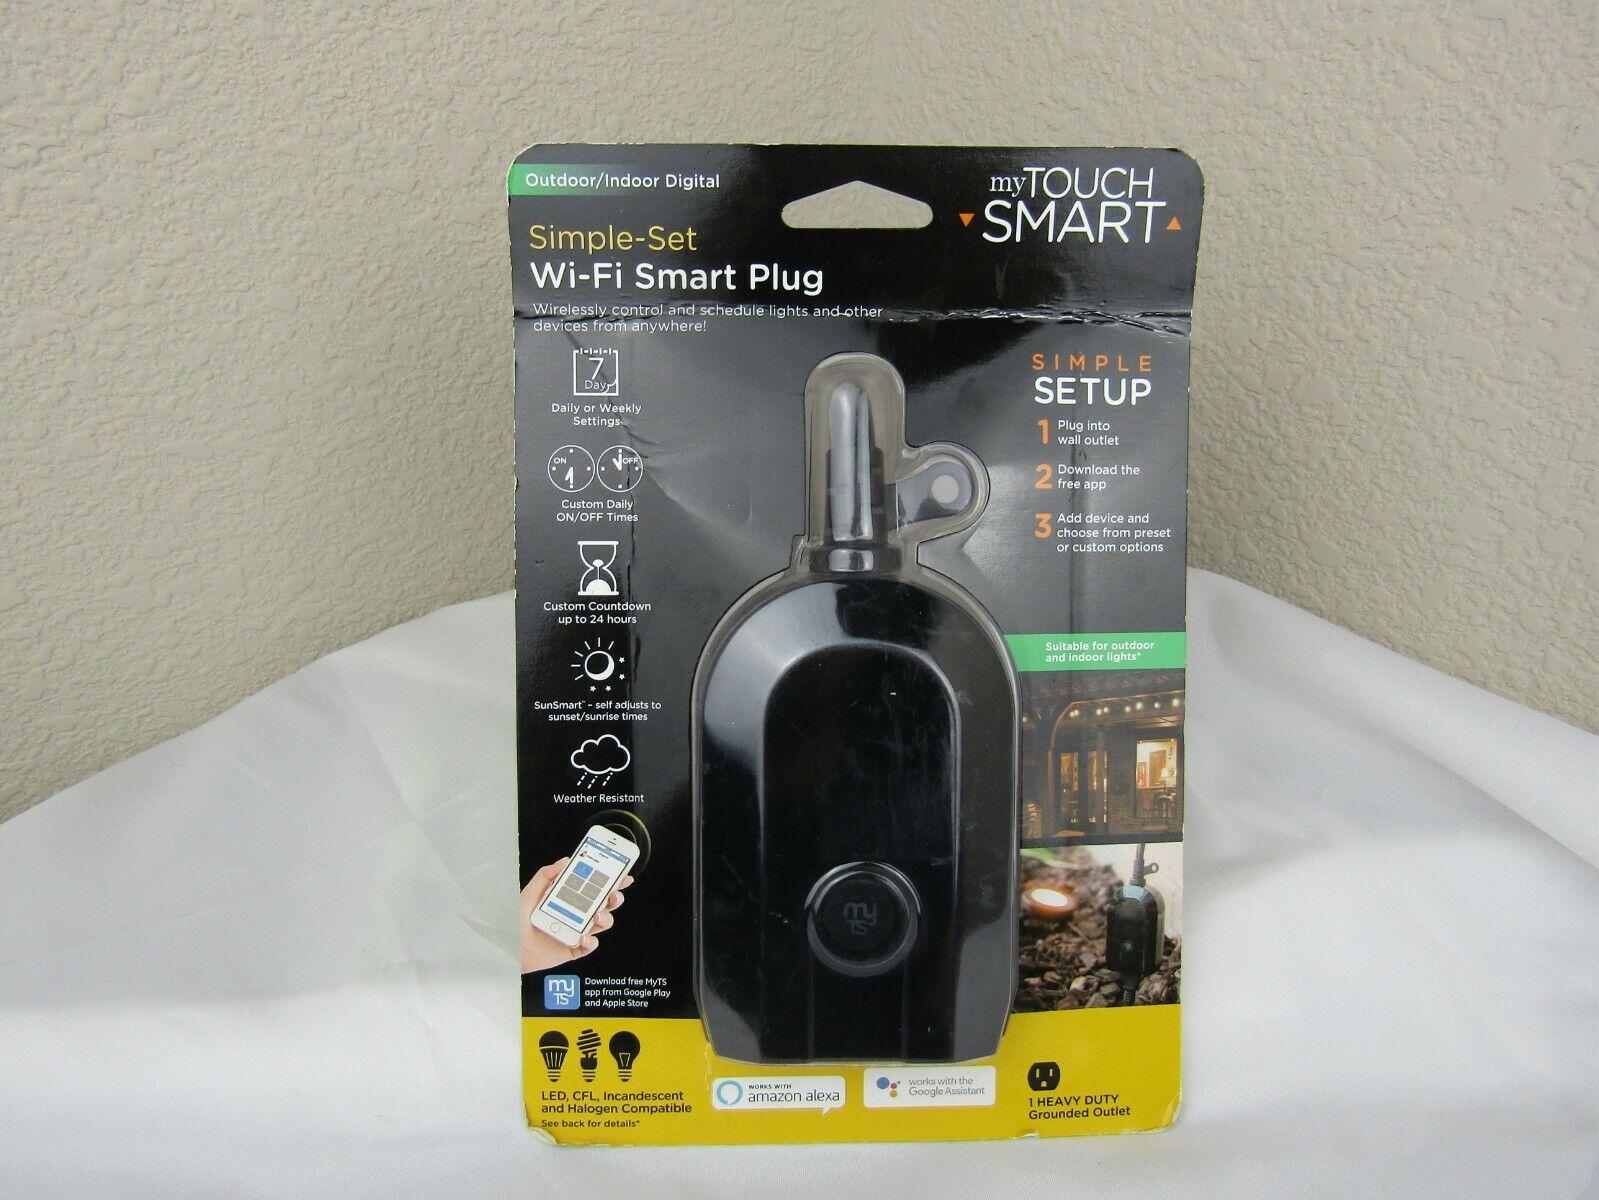 myTouchSmart WiFi Smart Switch, Outdoor/Indoor Digital Plug-